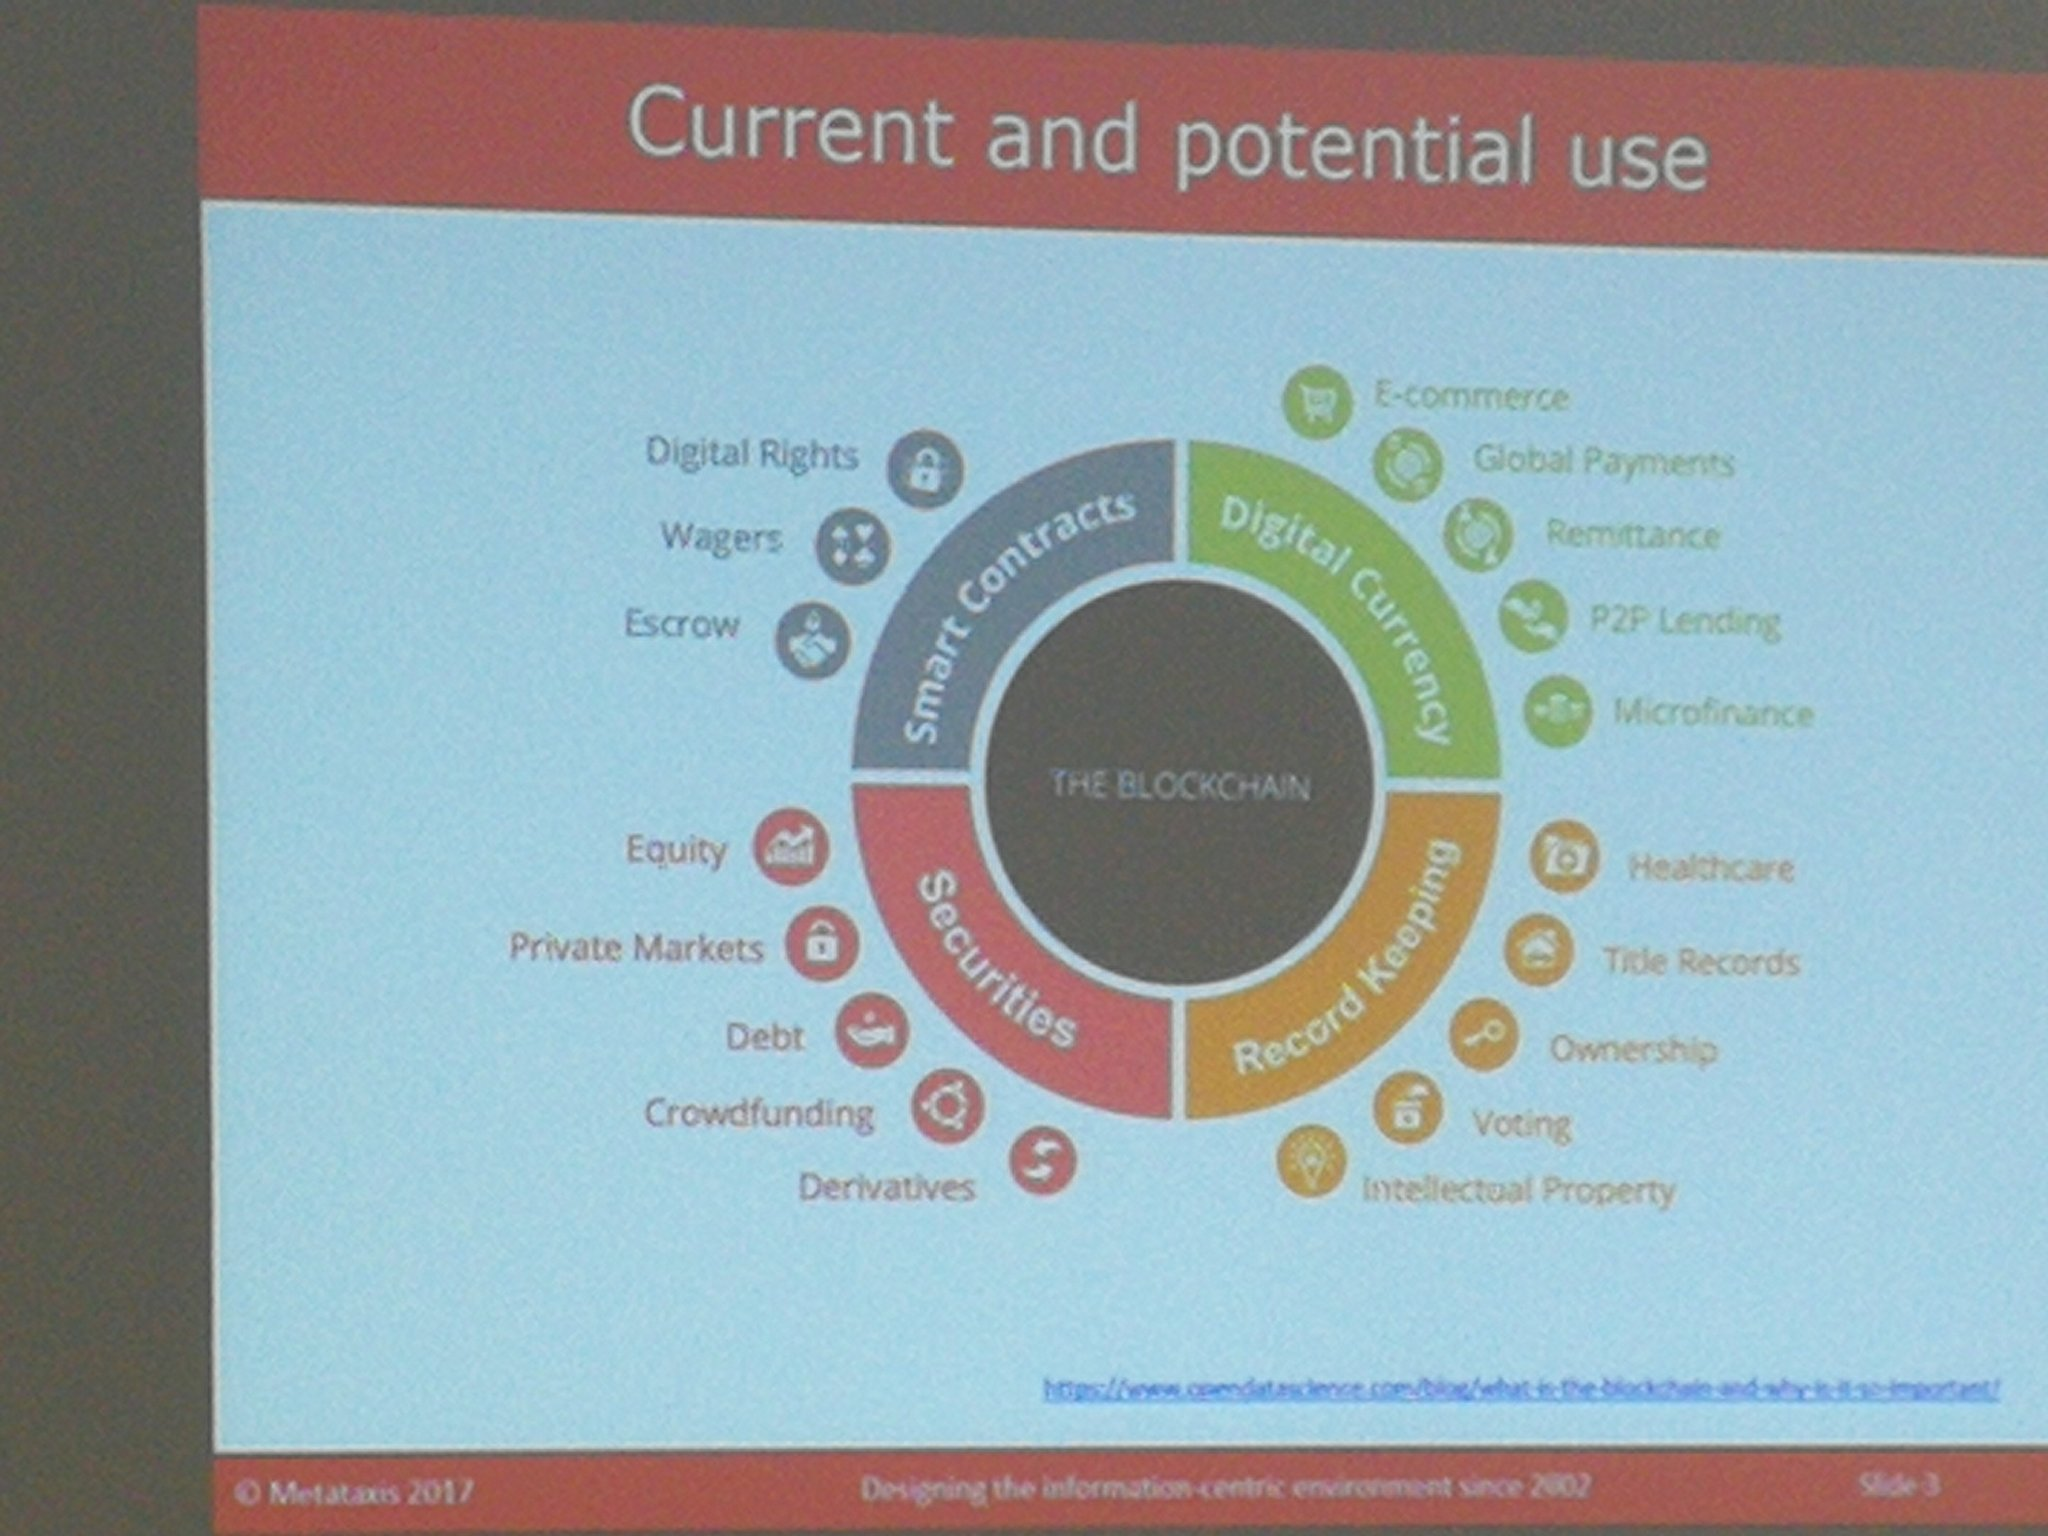 Applications of #blockchain - supply chain, identity verification #netikx86 https://t.co/KSzt9dOVYQ